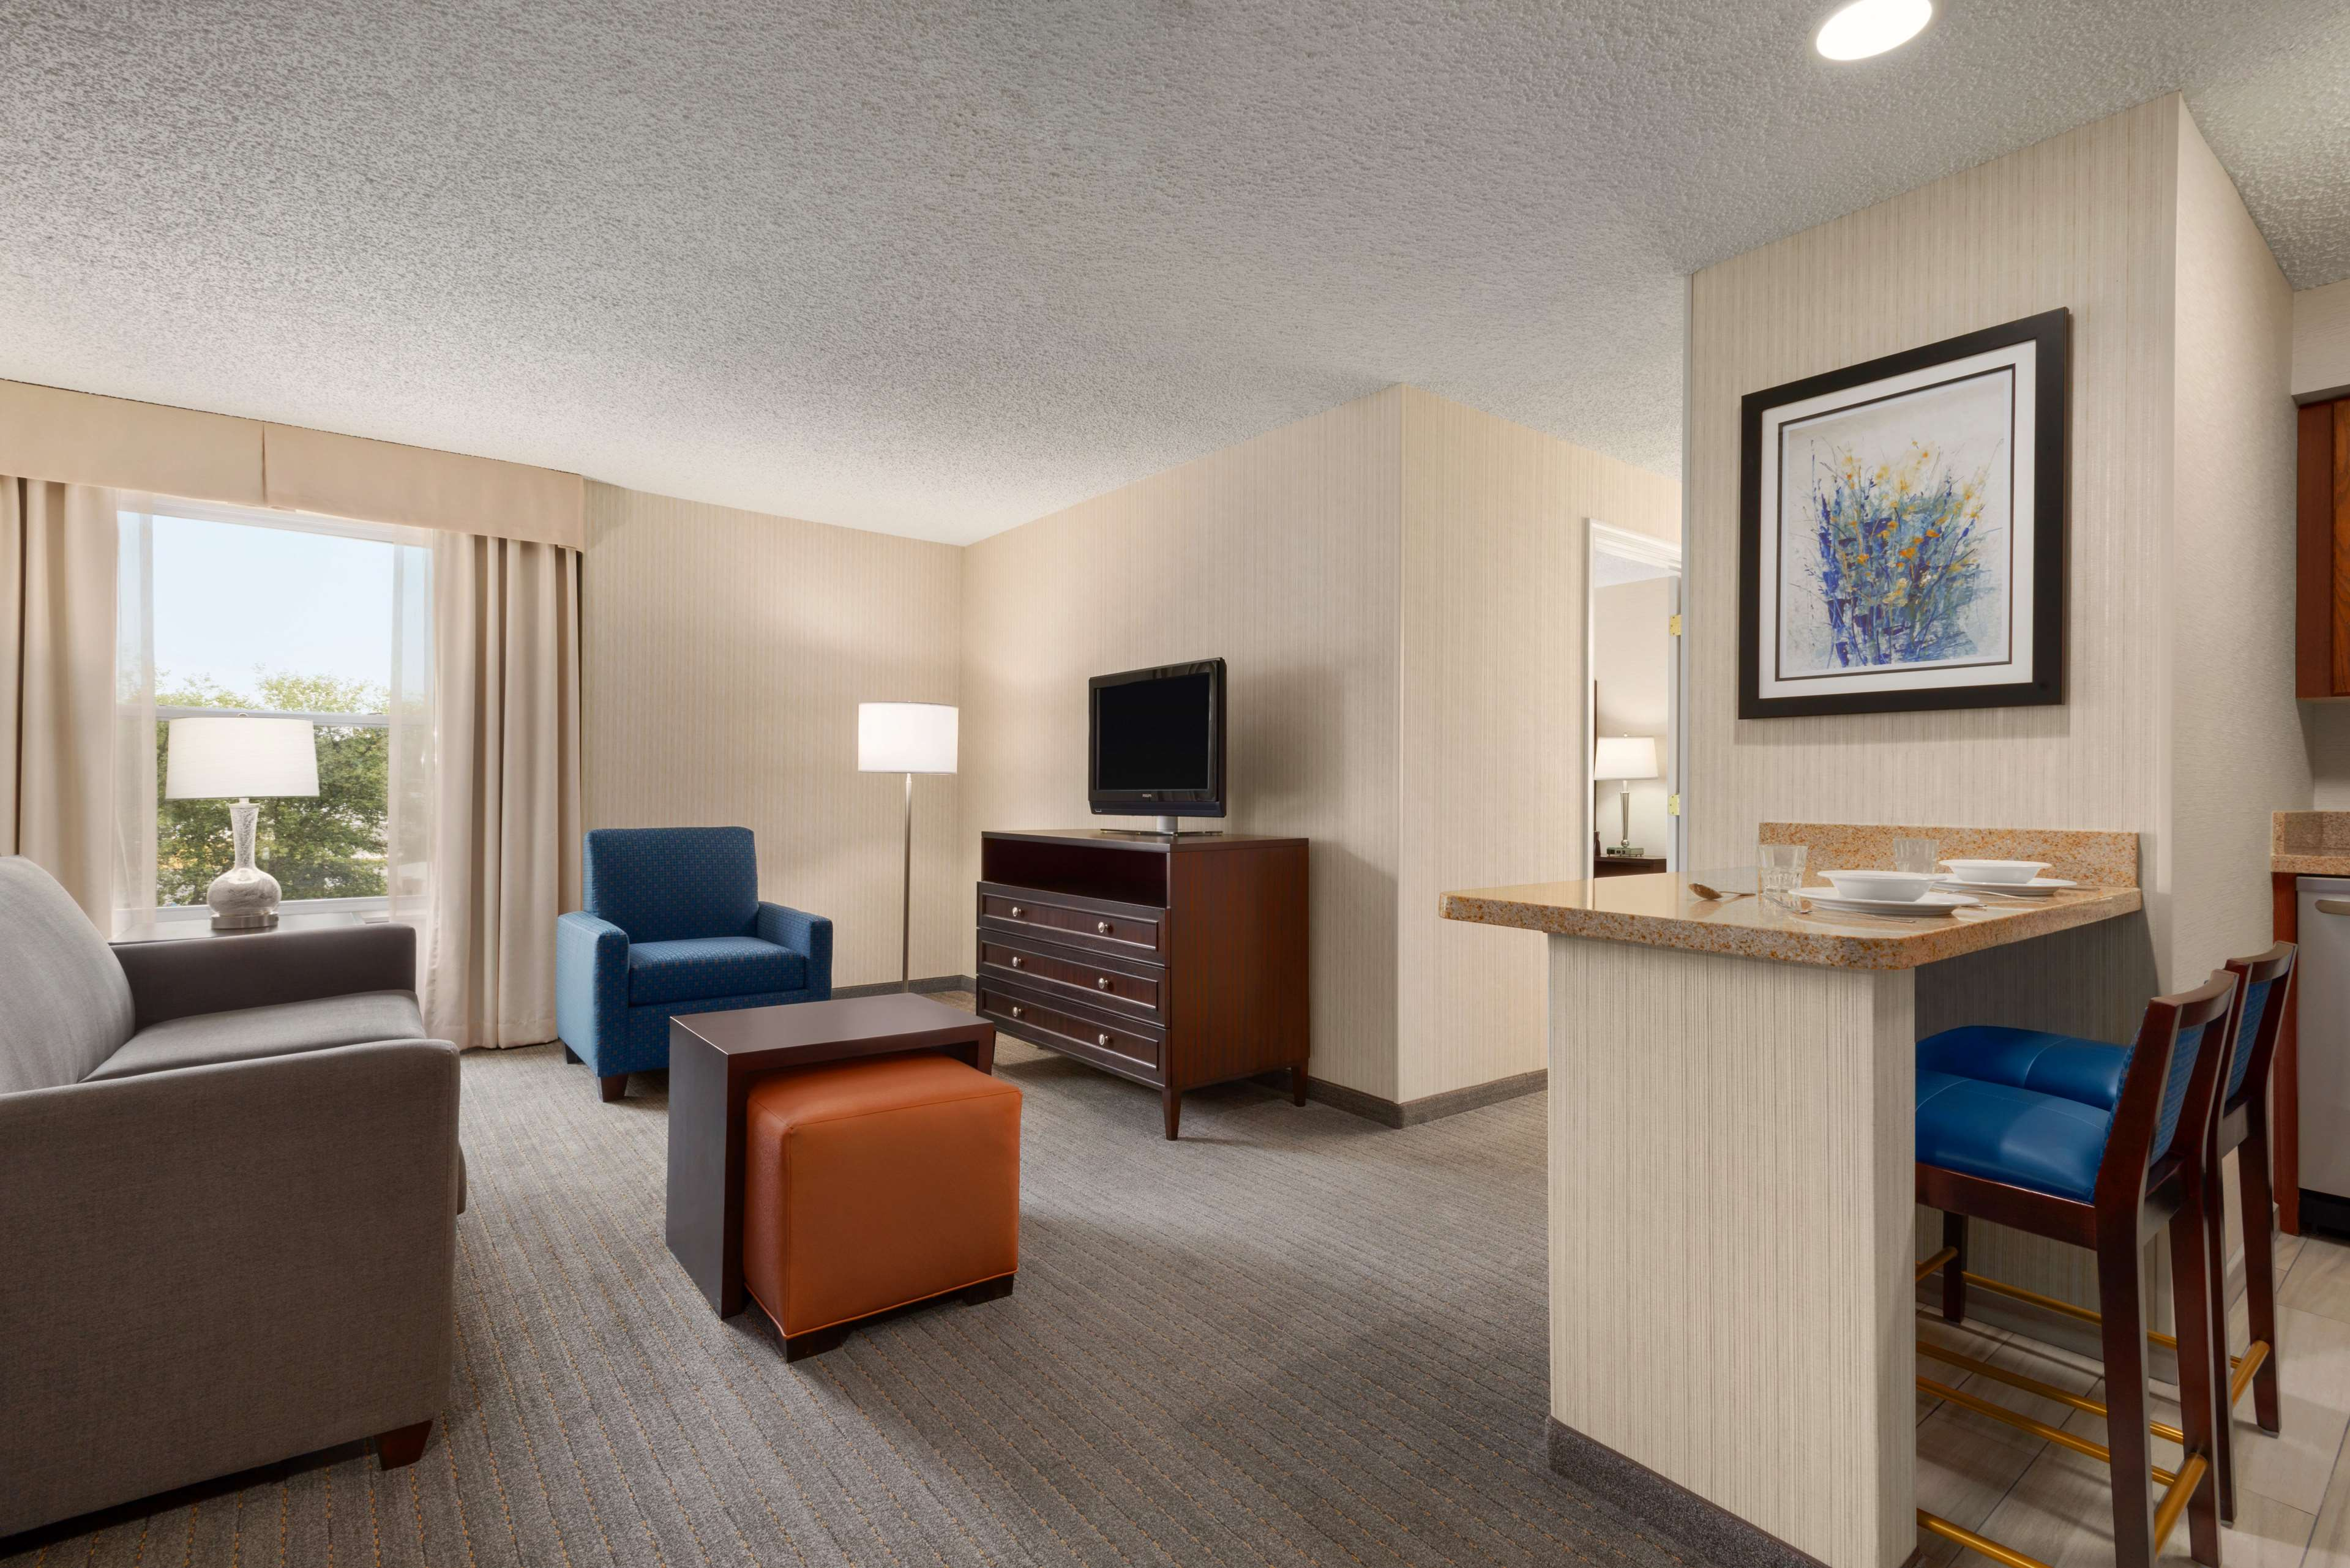 homewood suites by hilton wilmington brandywine valley in. Black Bedroom Furniture Sets. Home Design Ideas